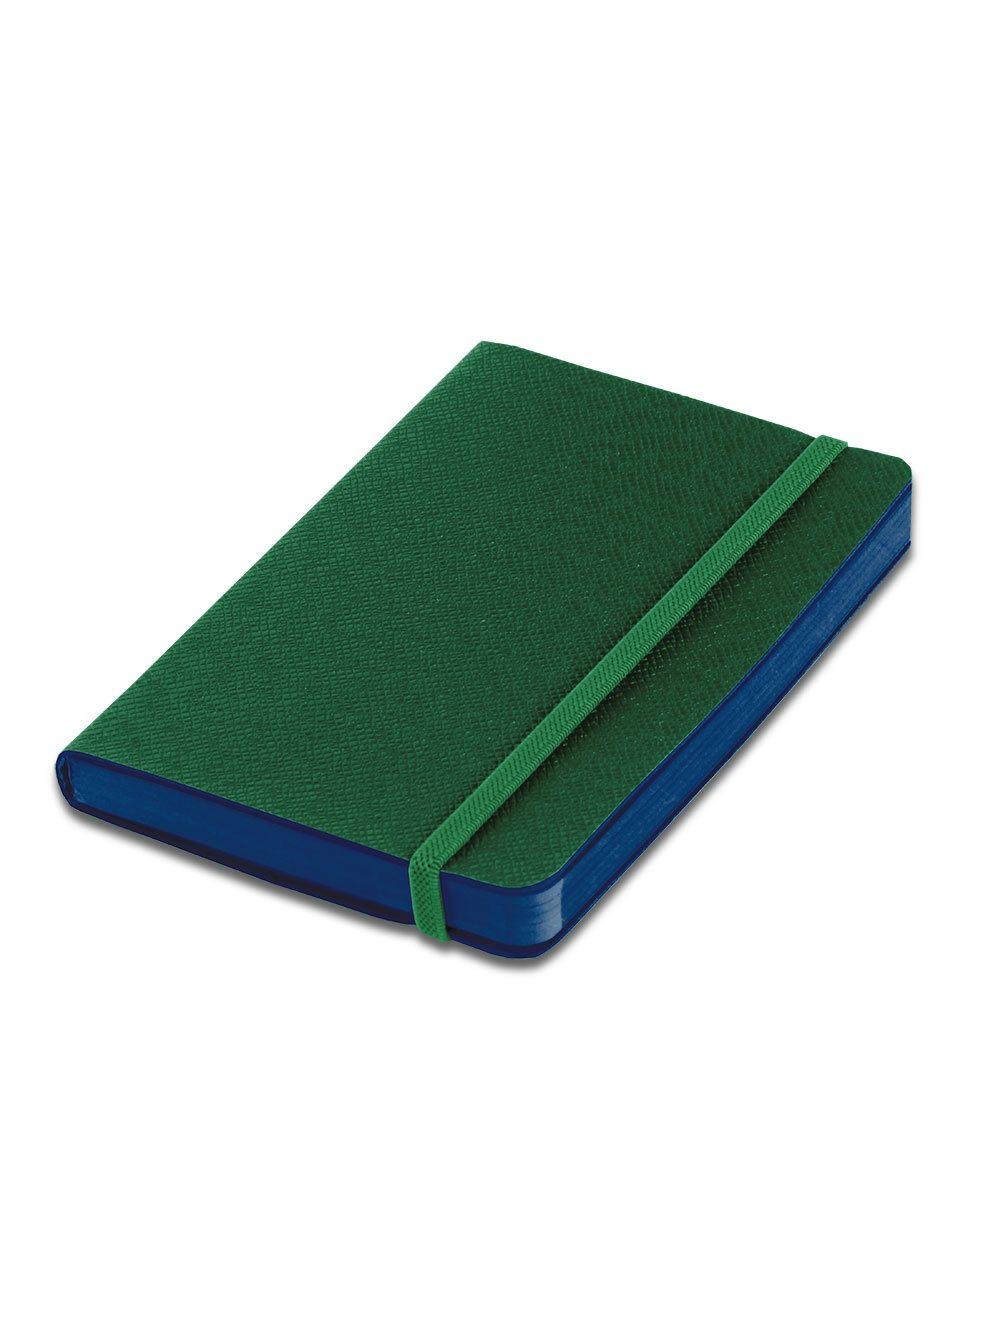 Journal Con Elastico 14,5 X 21 Cm - Coloured Internal Paper  - Pine